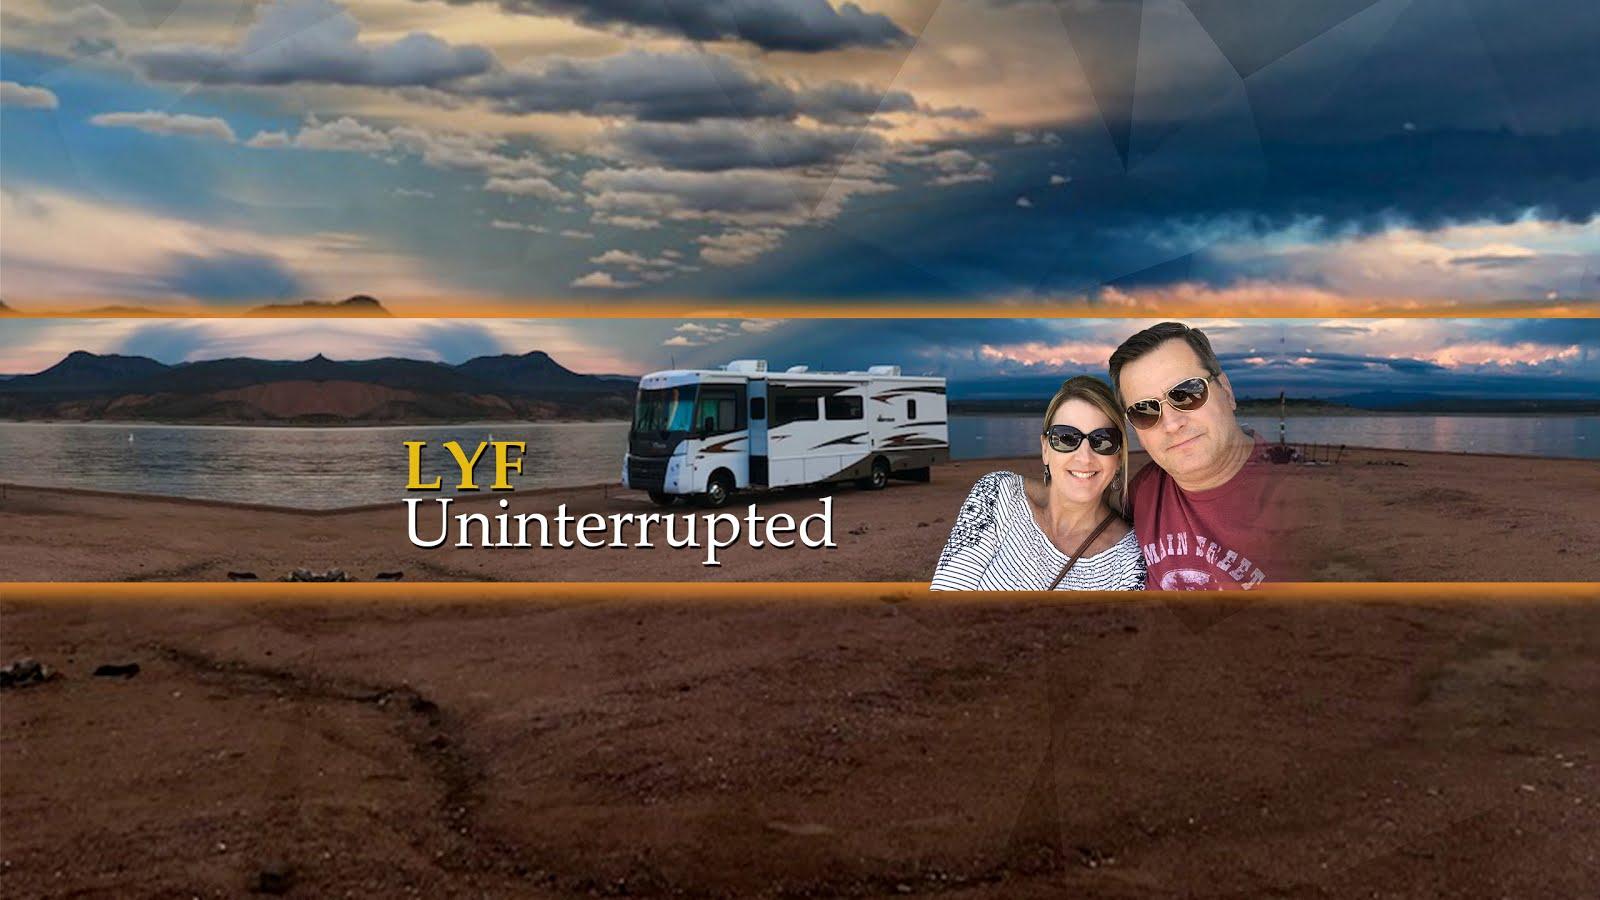 Lyf Uninterrupted